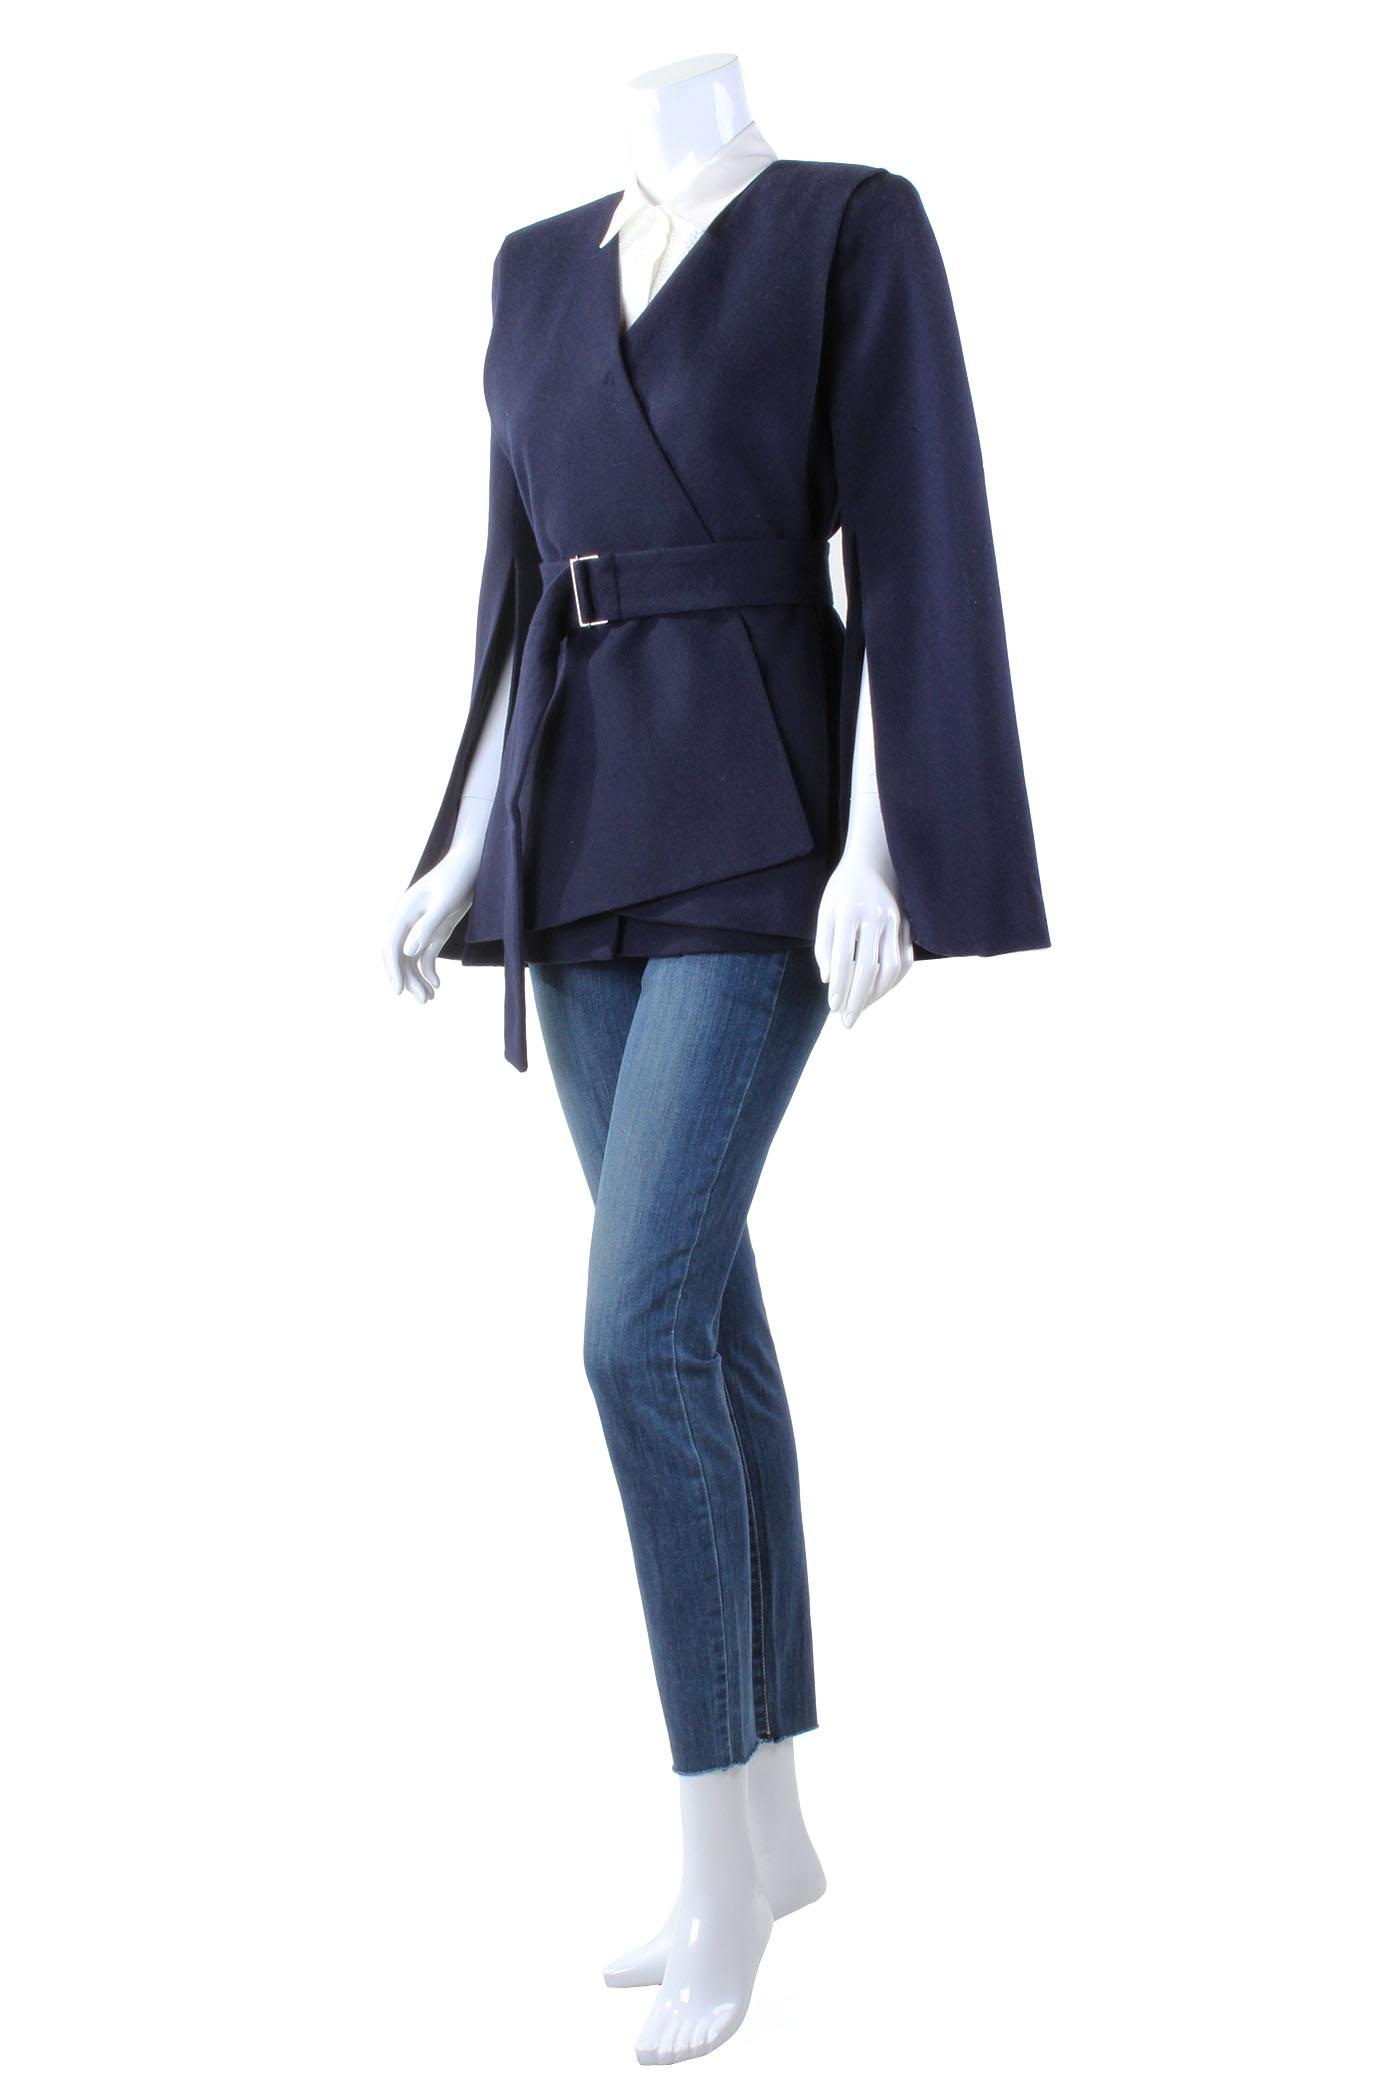 Cosette Phoebe Wool Coat Garmentory